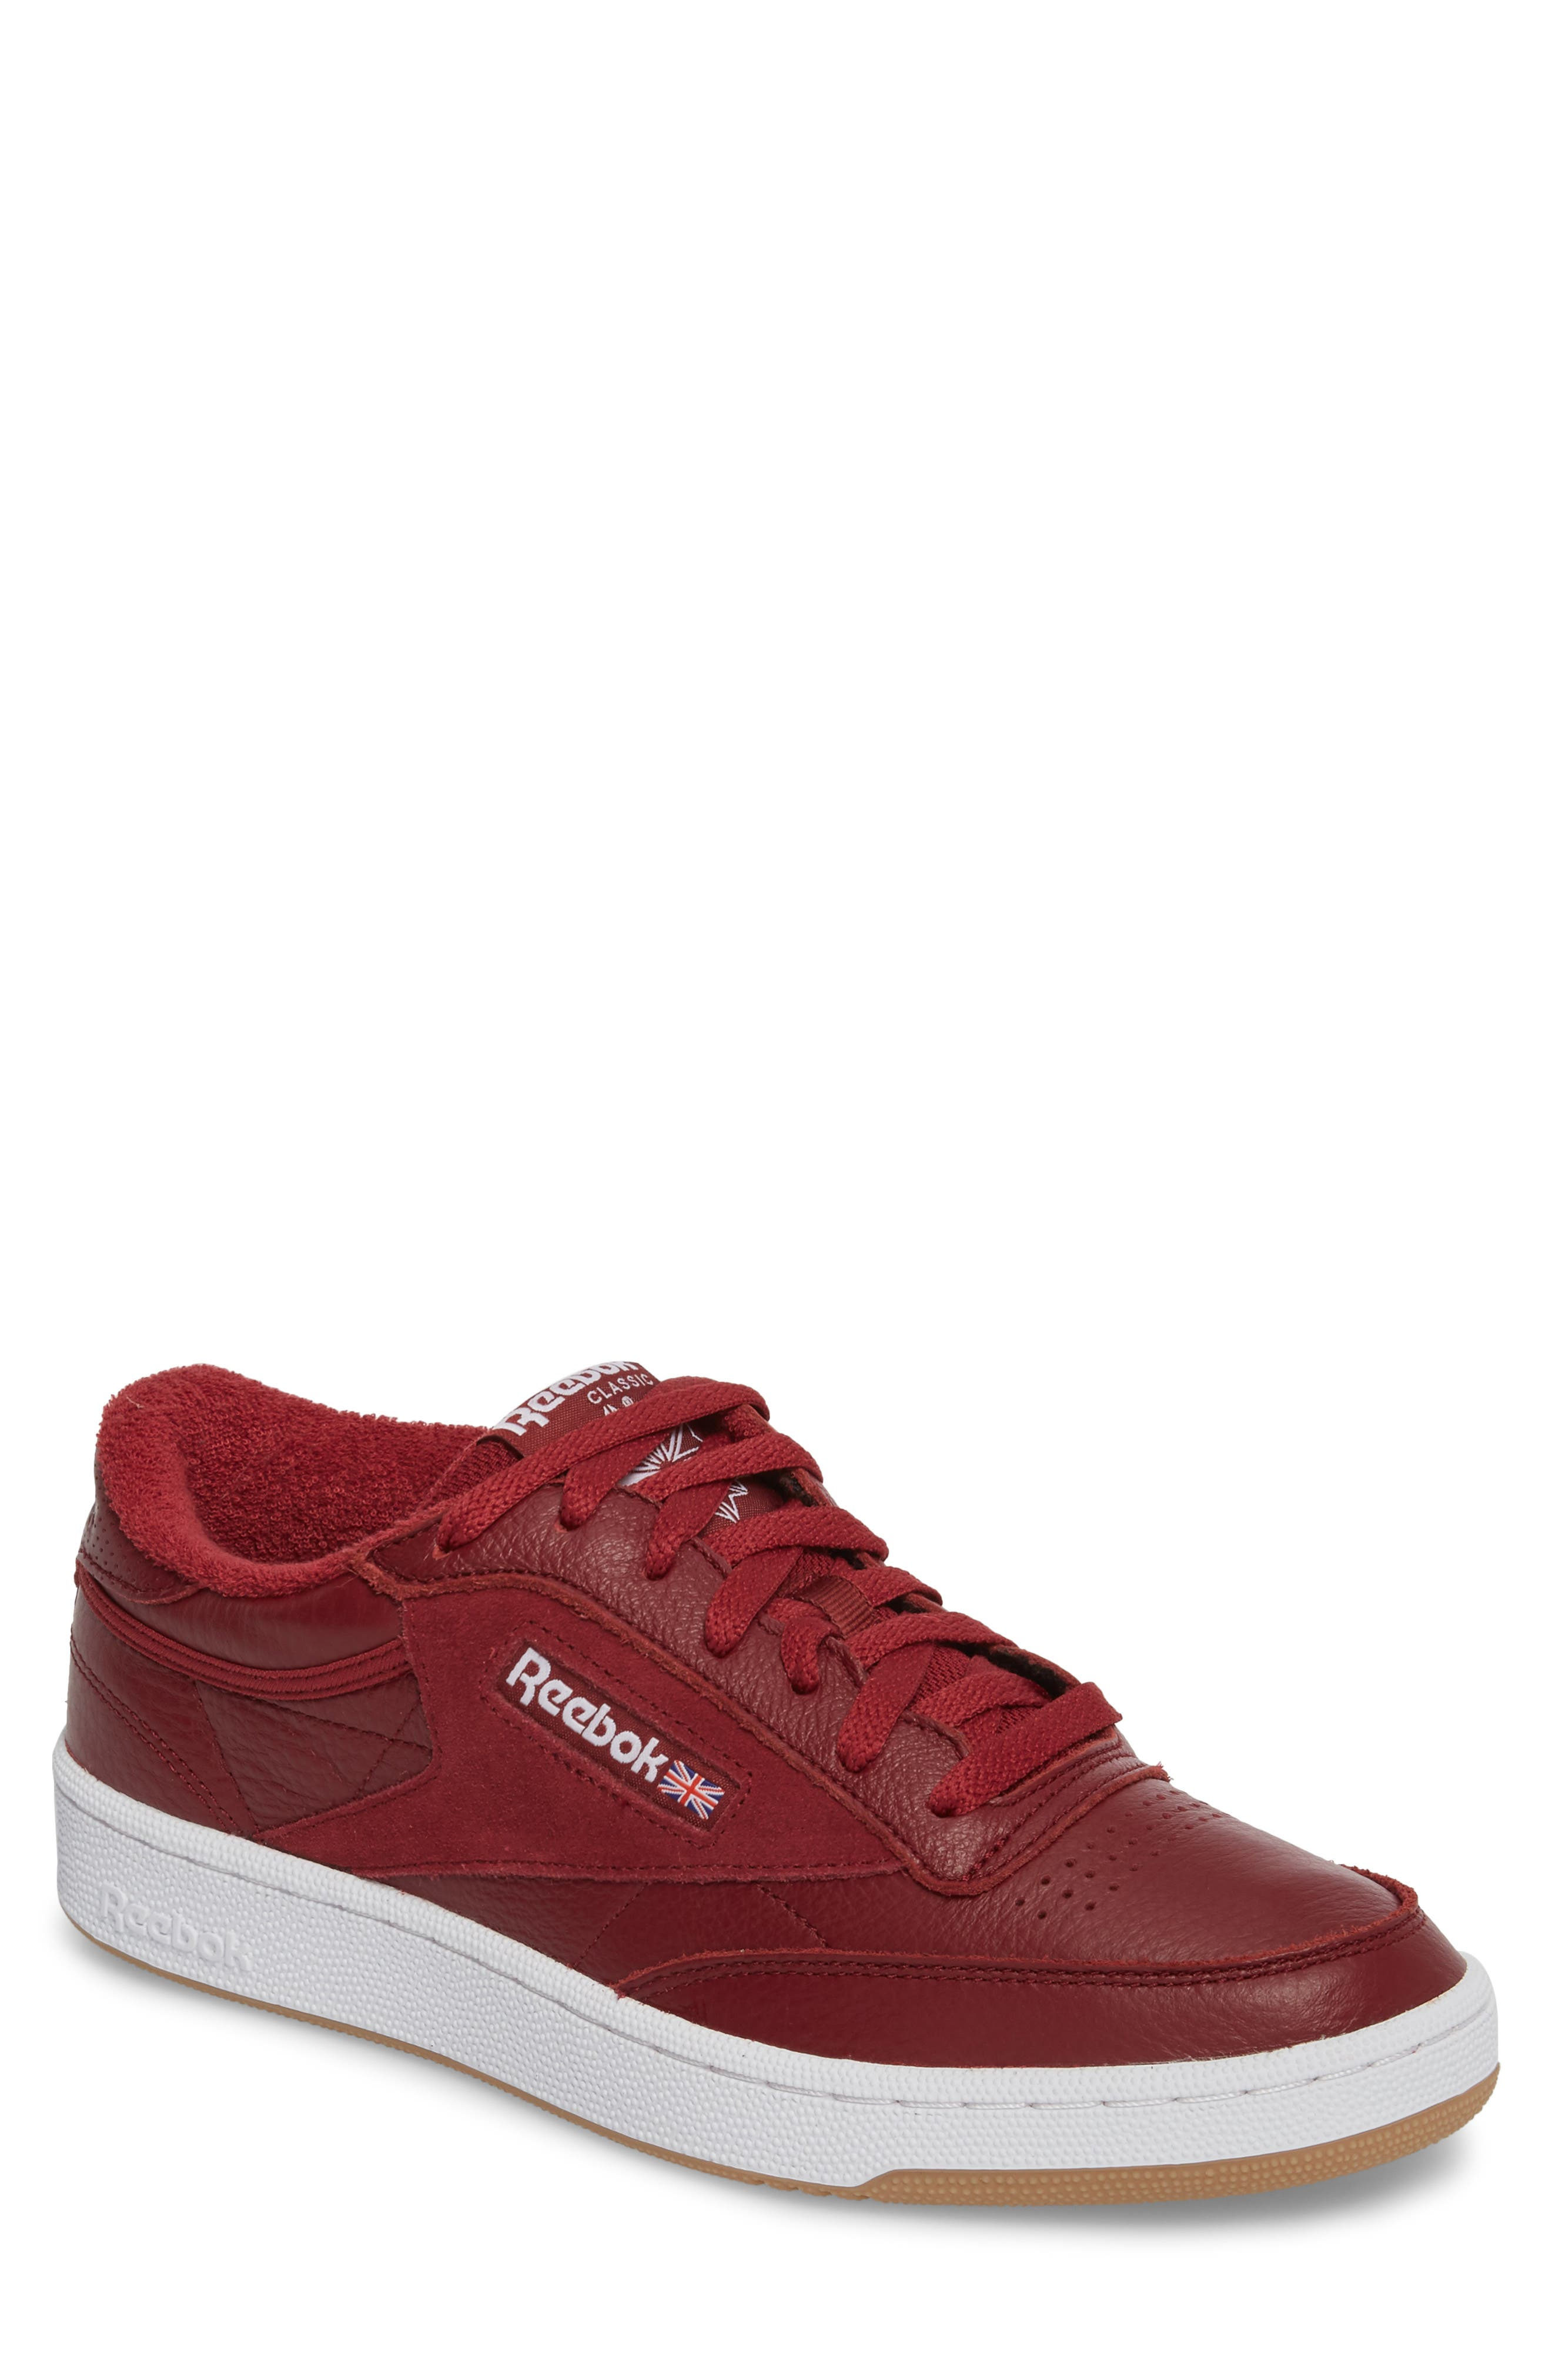 Club C 85 ESTL Sneaker,                             Main thumbnail 2, color,